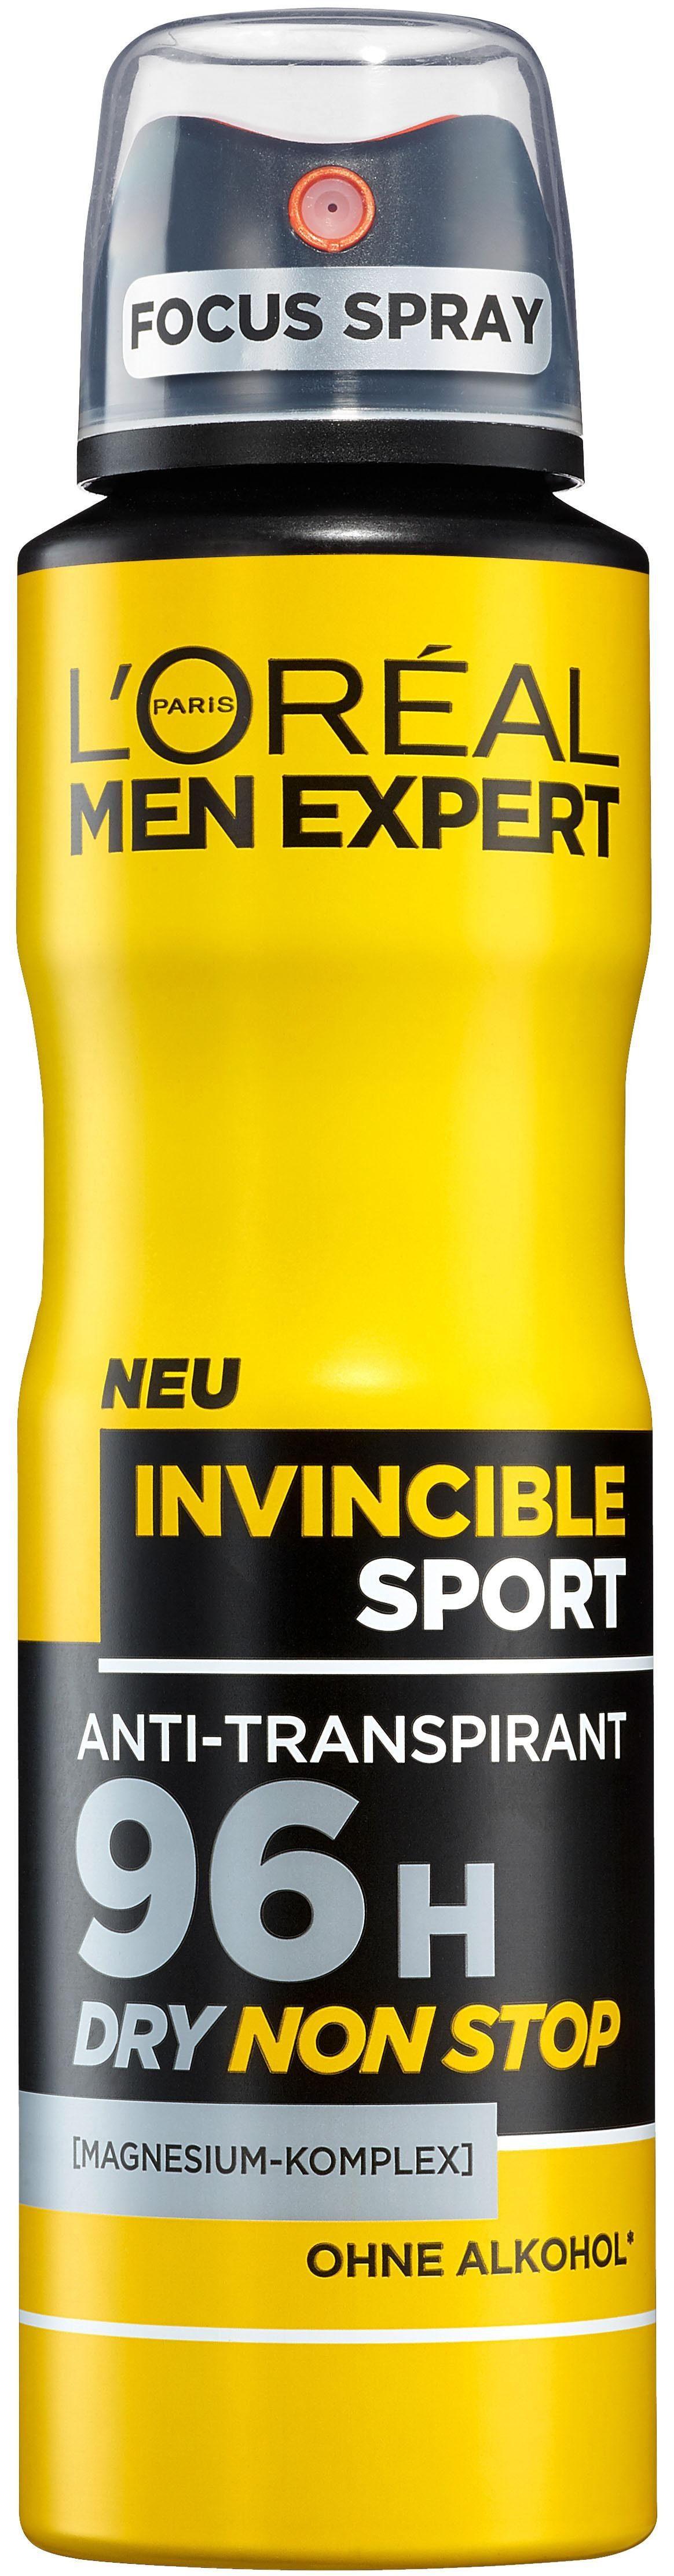 L'Oréal Paris Men Expert, »Invincible Sport«, Deo-Spray